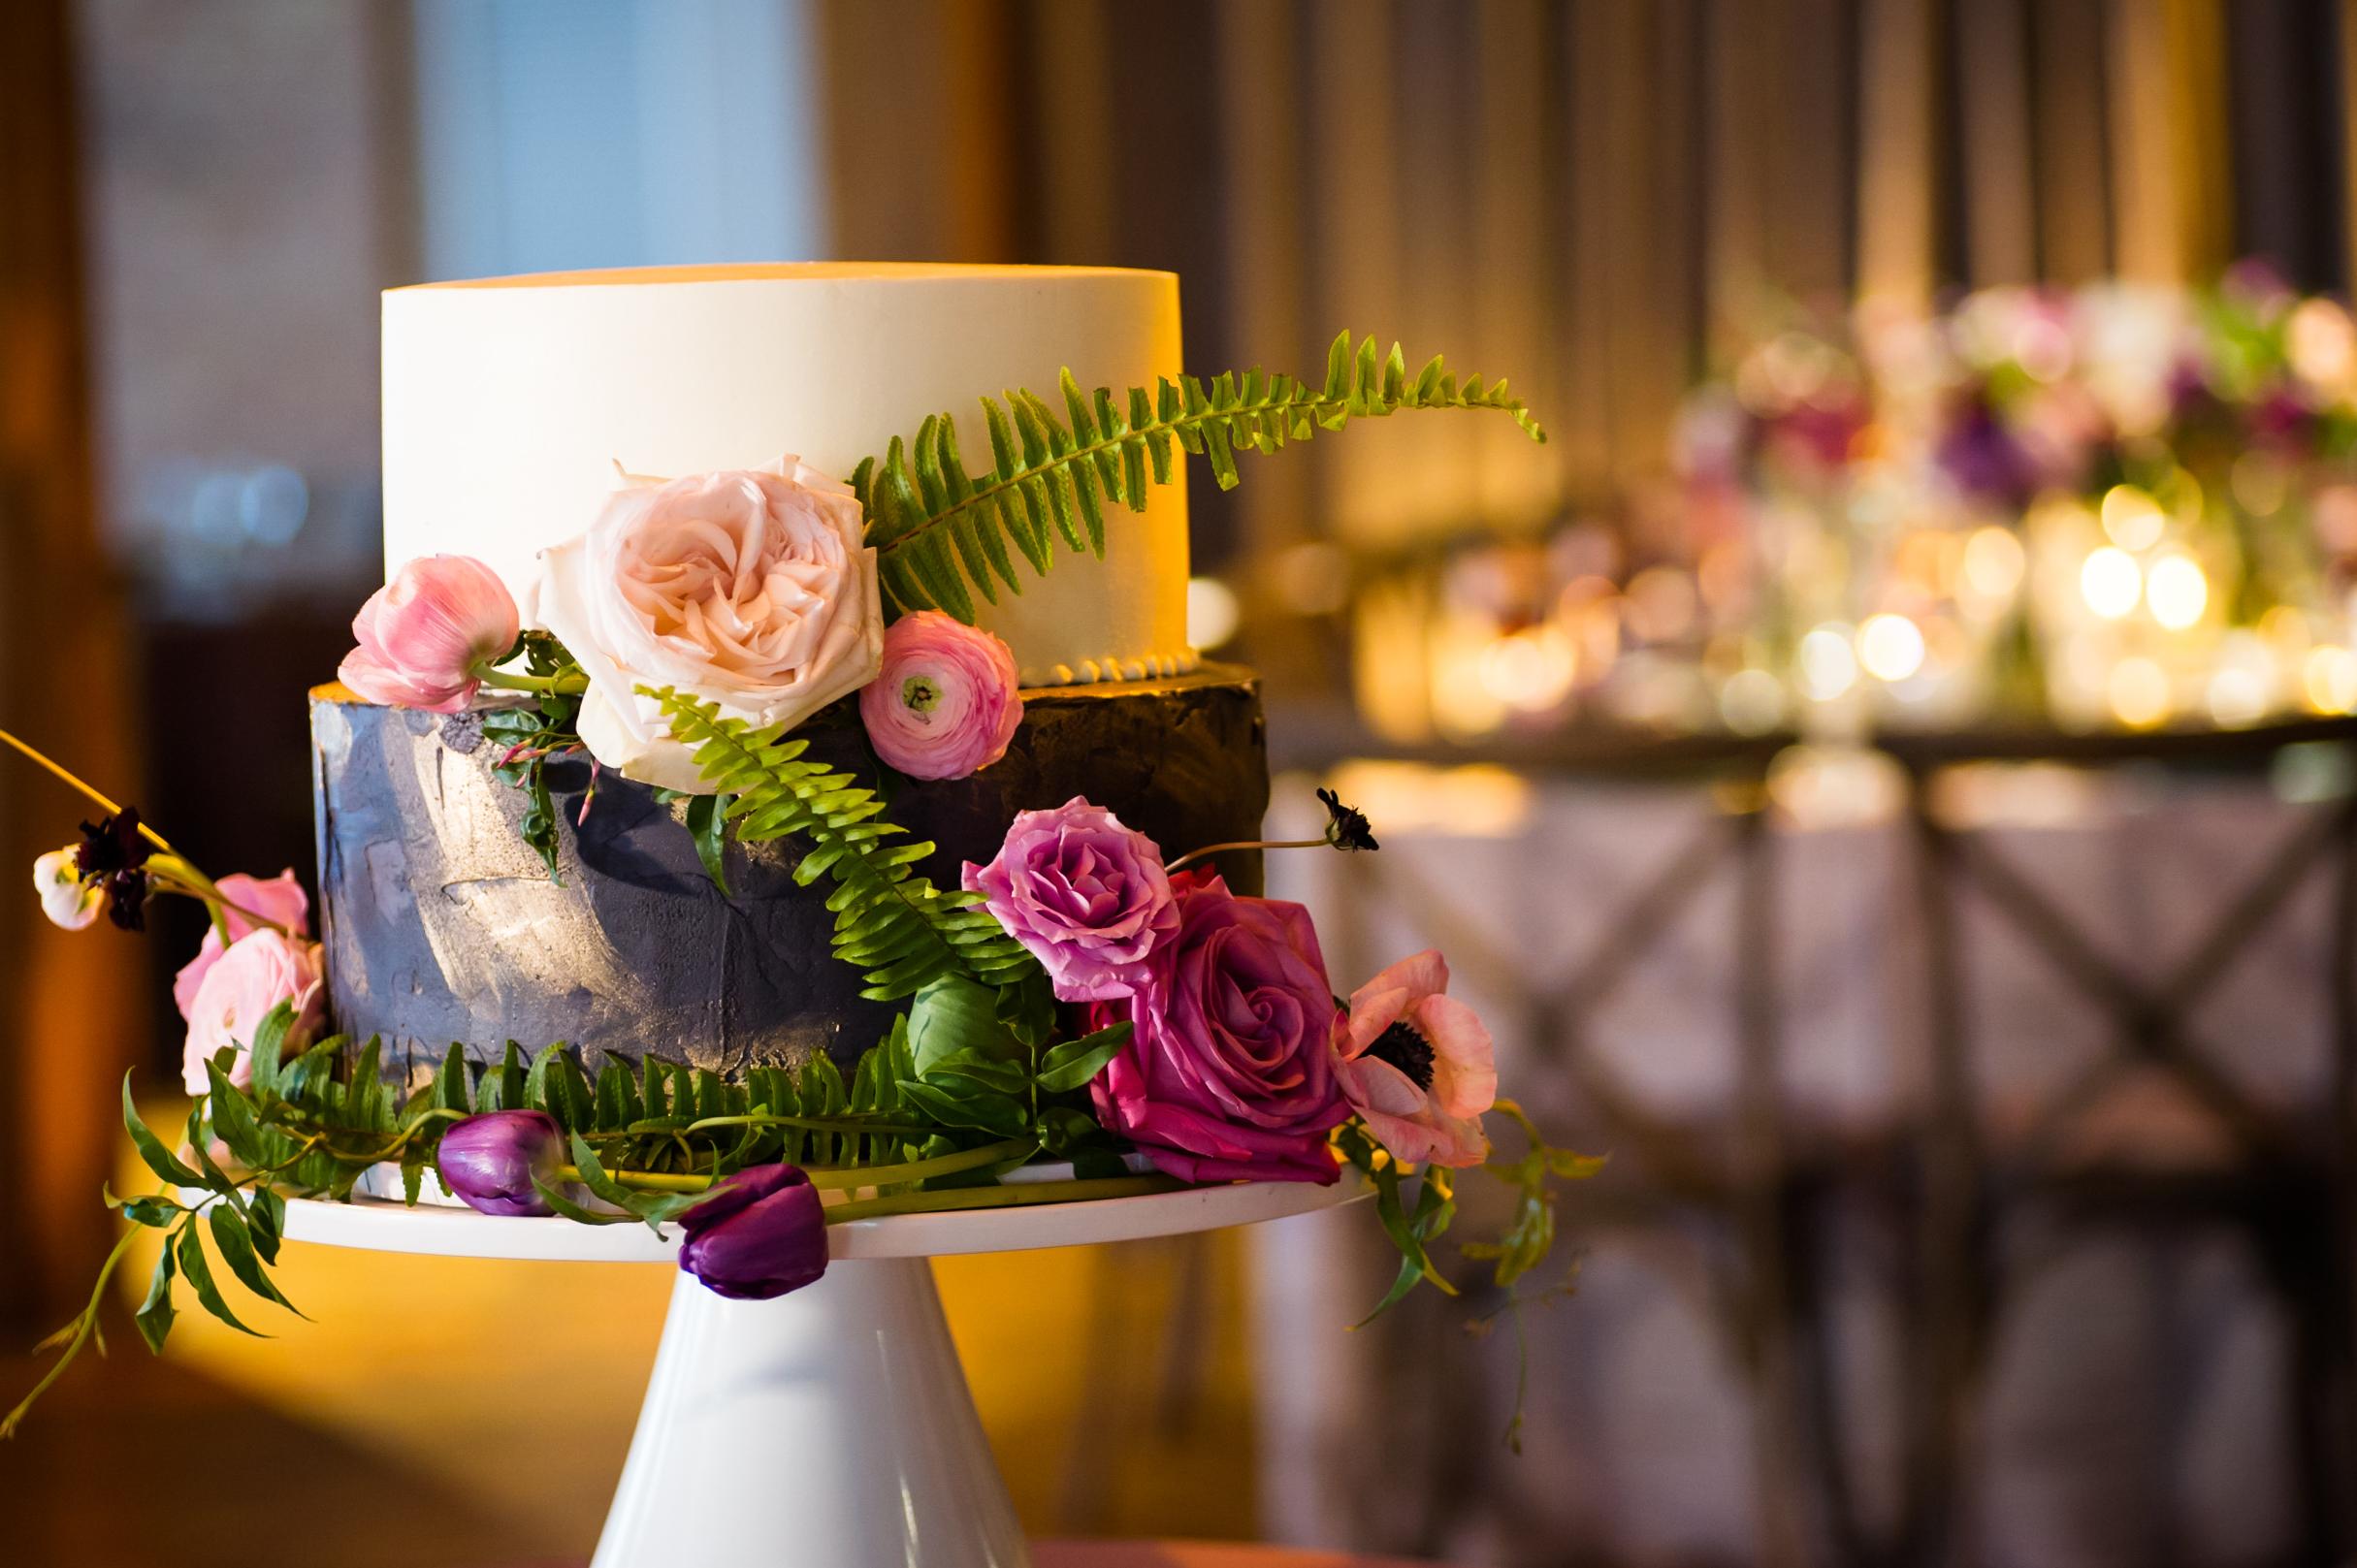 - NEW FEAURE INCHICAGO STYLE WEDDINGS